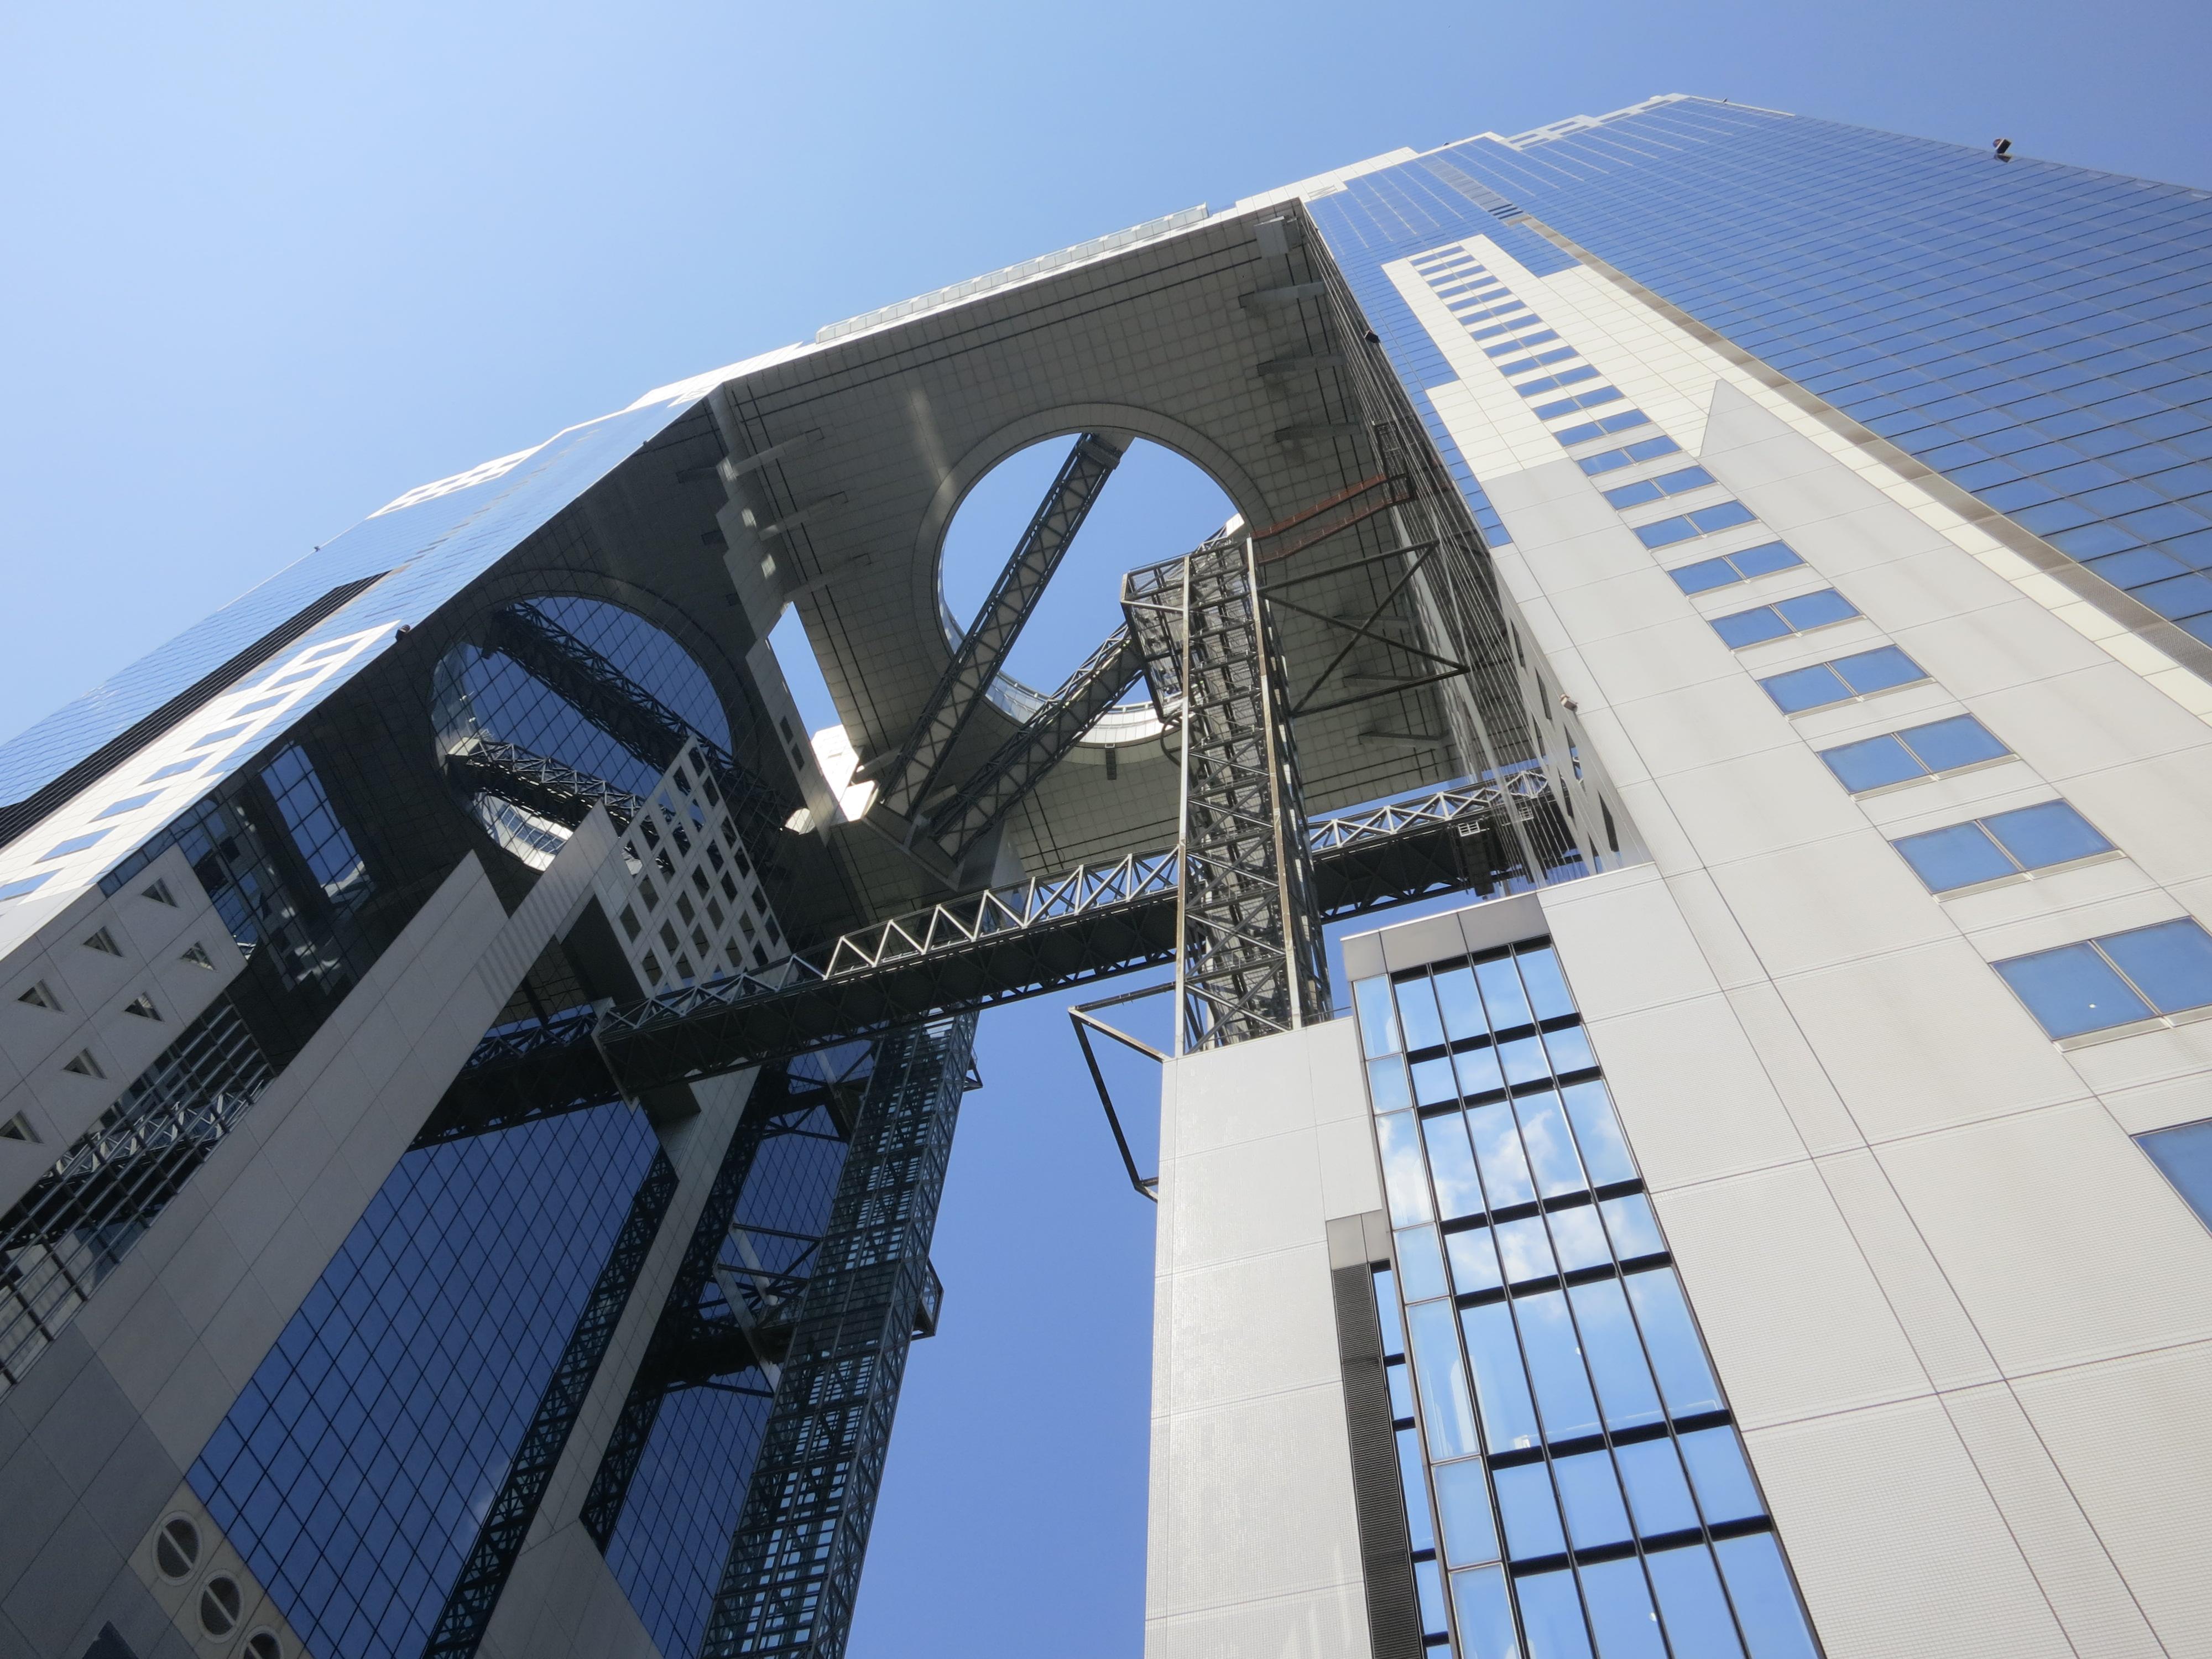 Umeda Sky Building 1 – Looking Up  Temporarily Lost